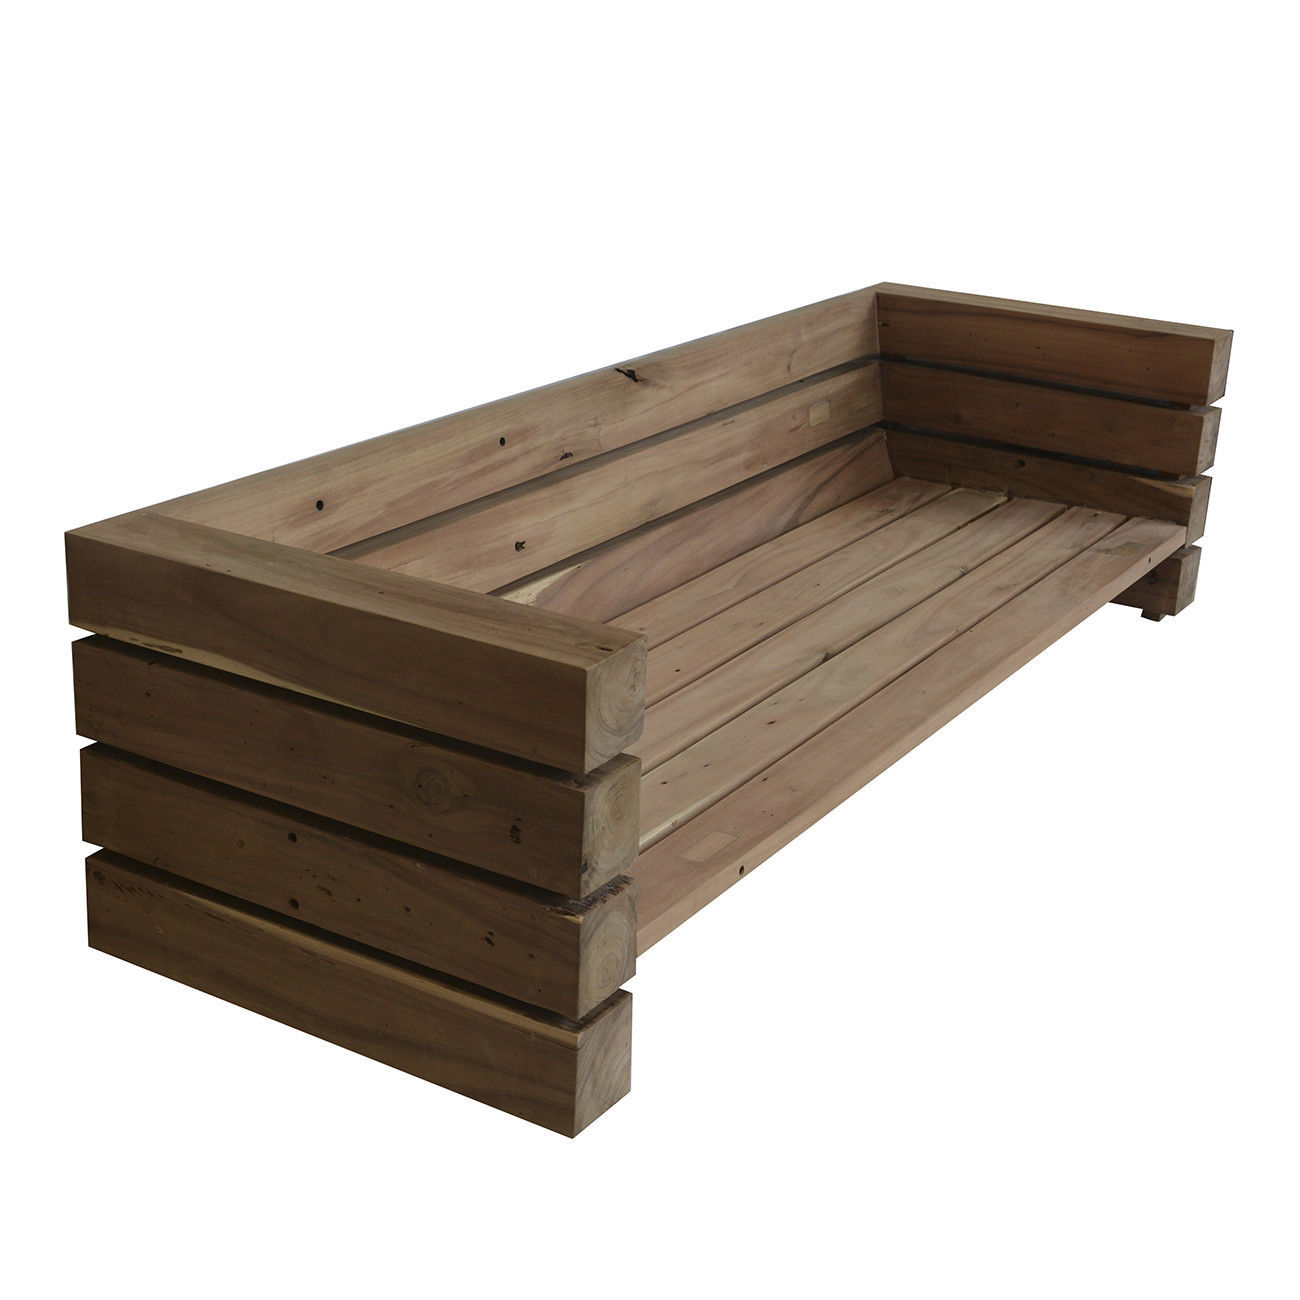 Awesome Teak Plank Log Sofa,88'' x 29''H